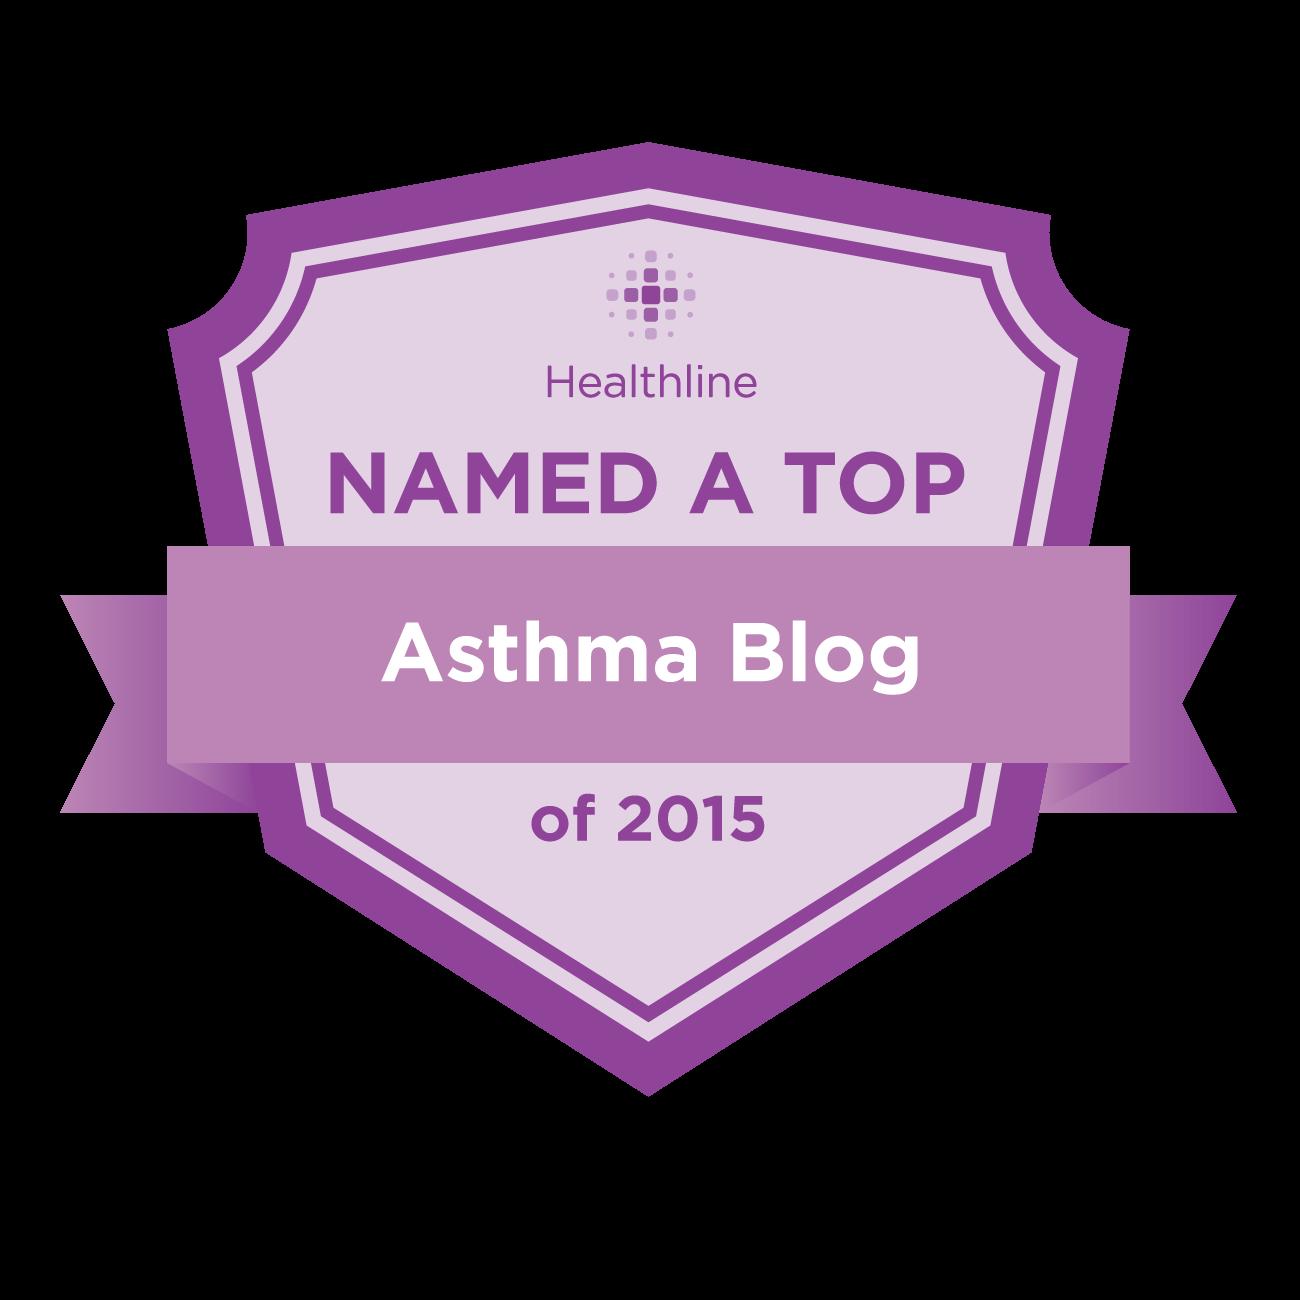 asthma best blogs badge